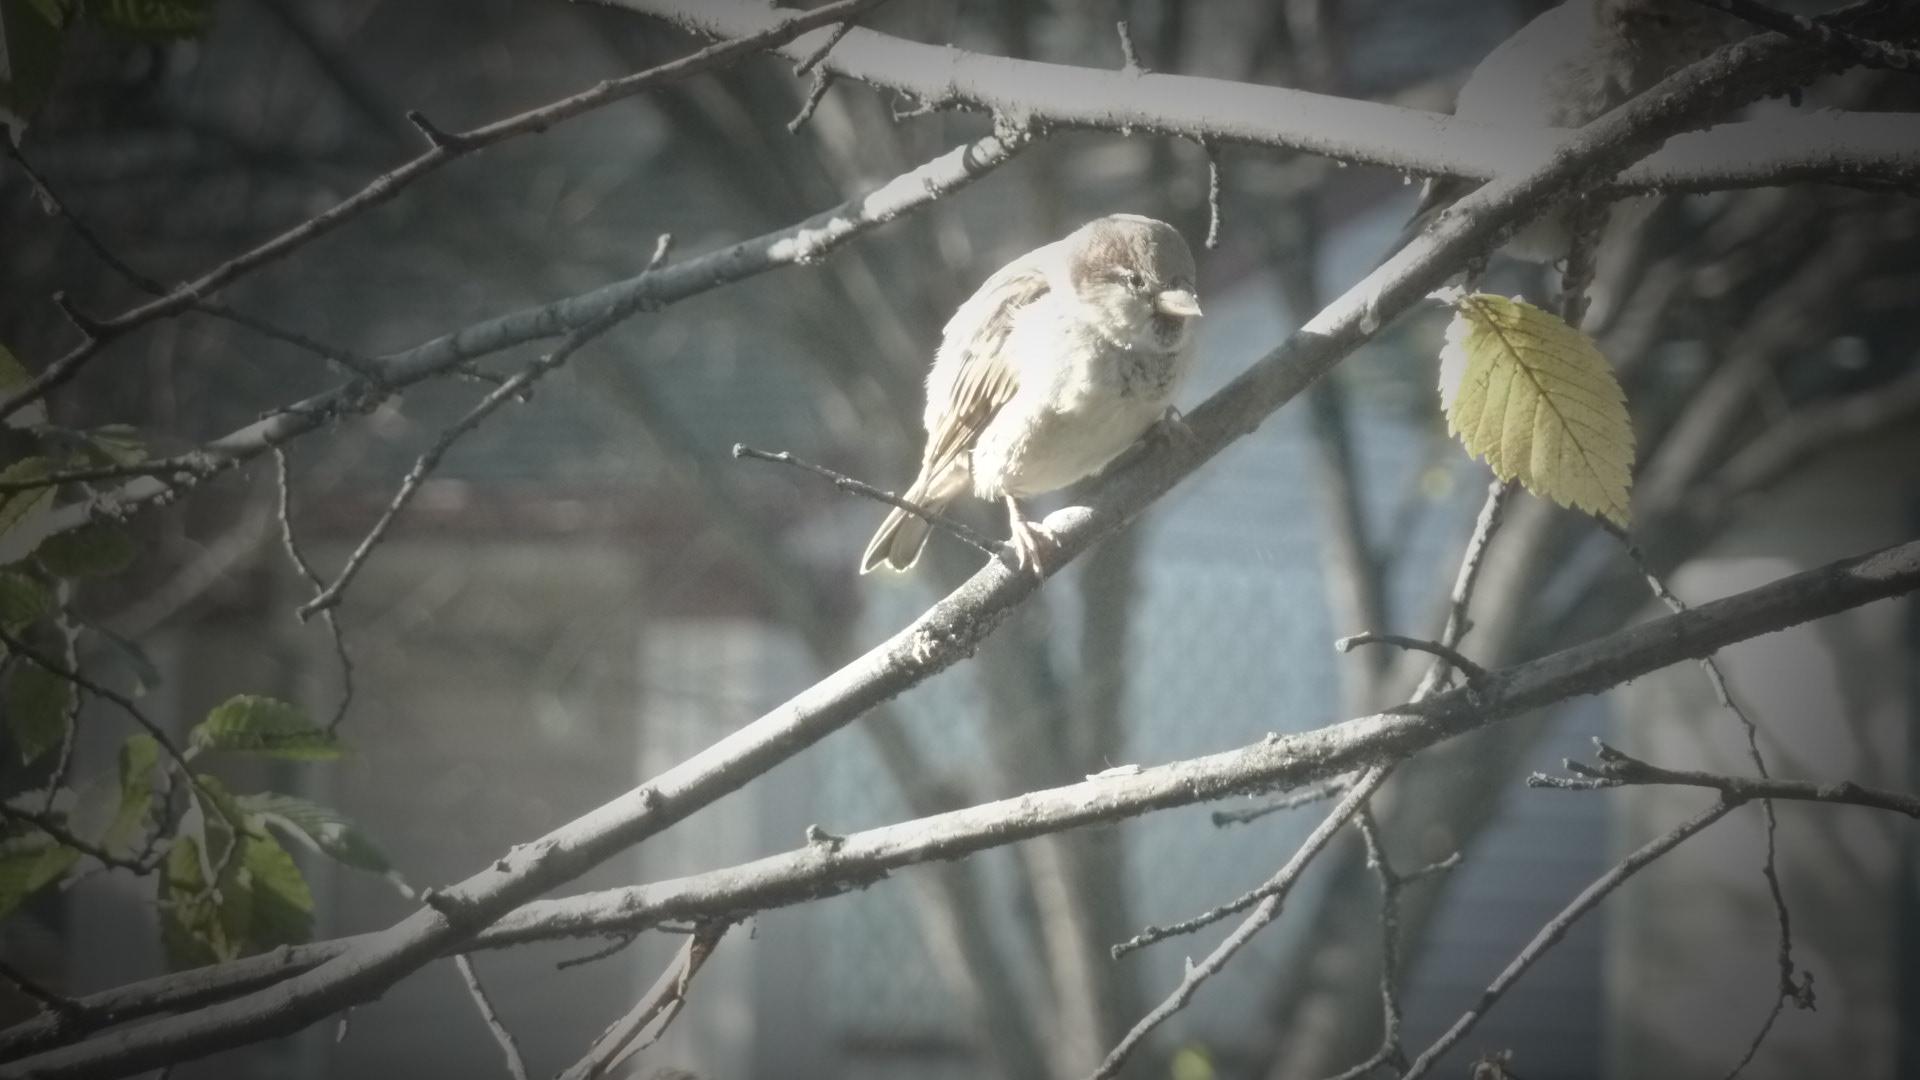 One Sparrow Photo Credit: Kathleen Moors